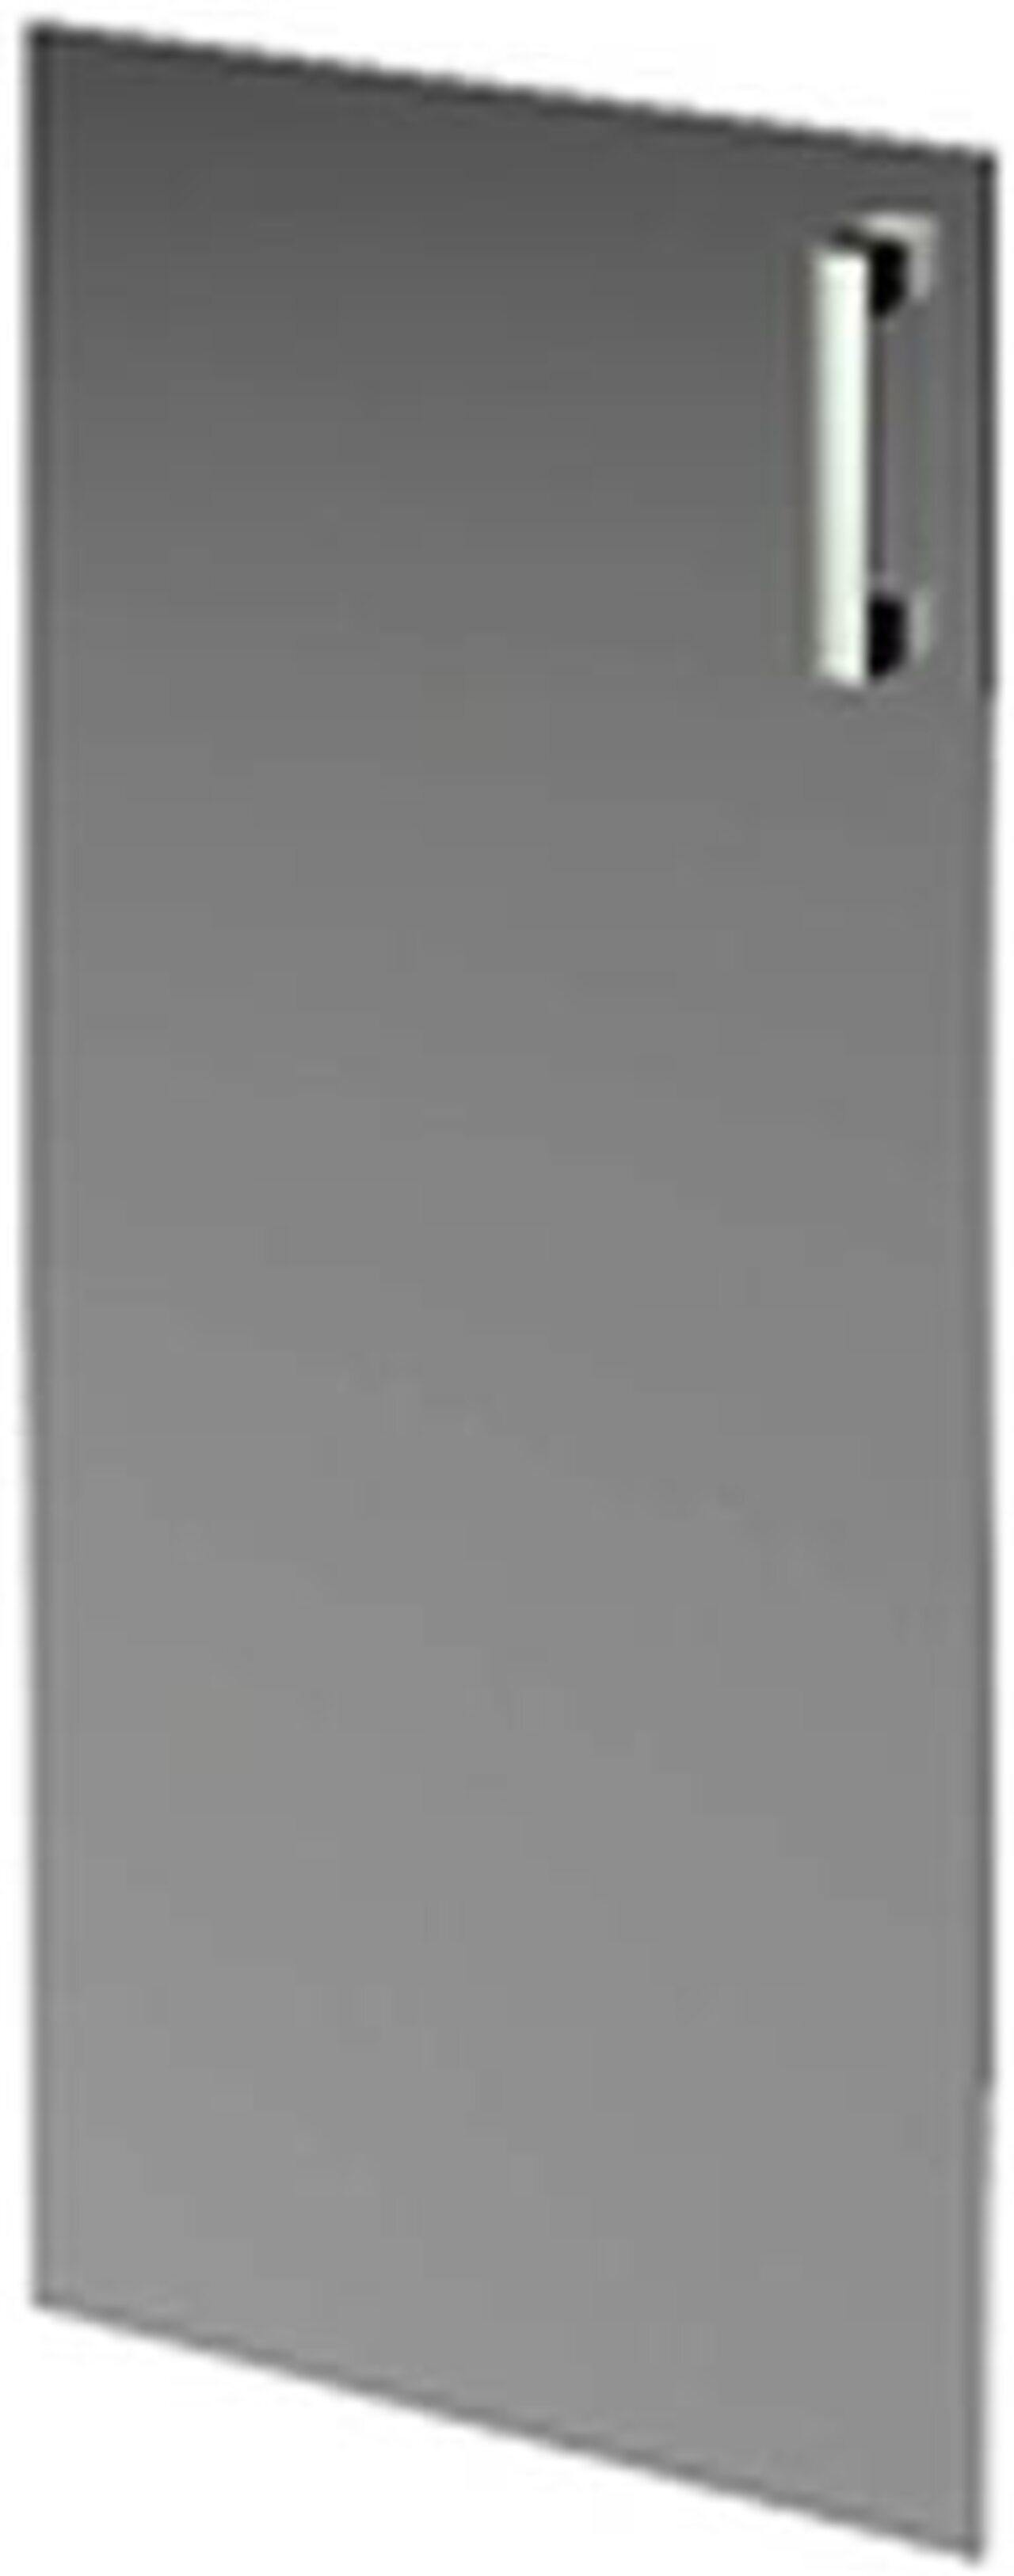 Дверь средняя стеклянная  Аргентум 39x1x118 - фото 1